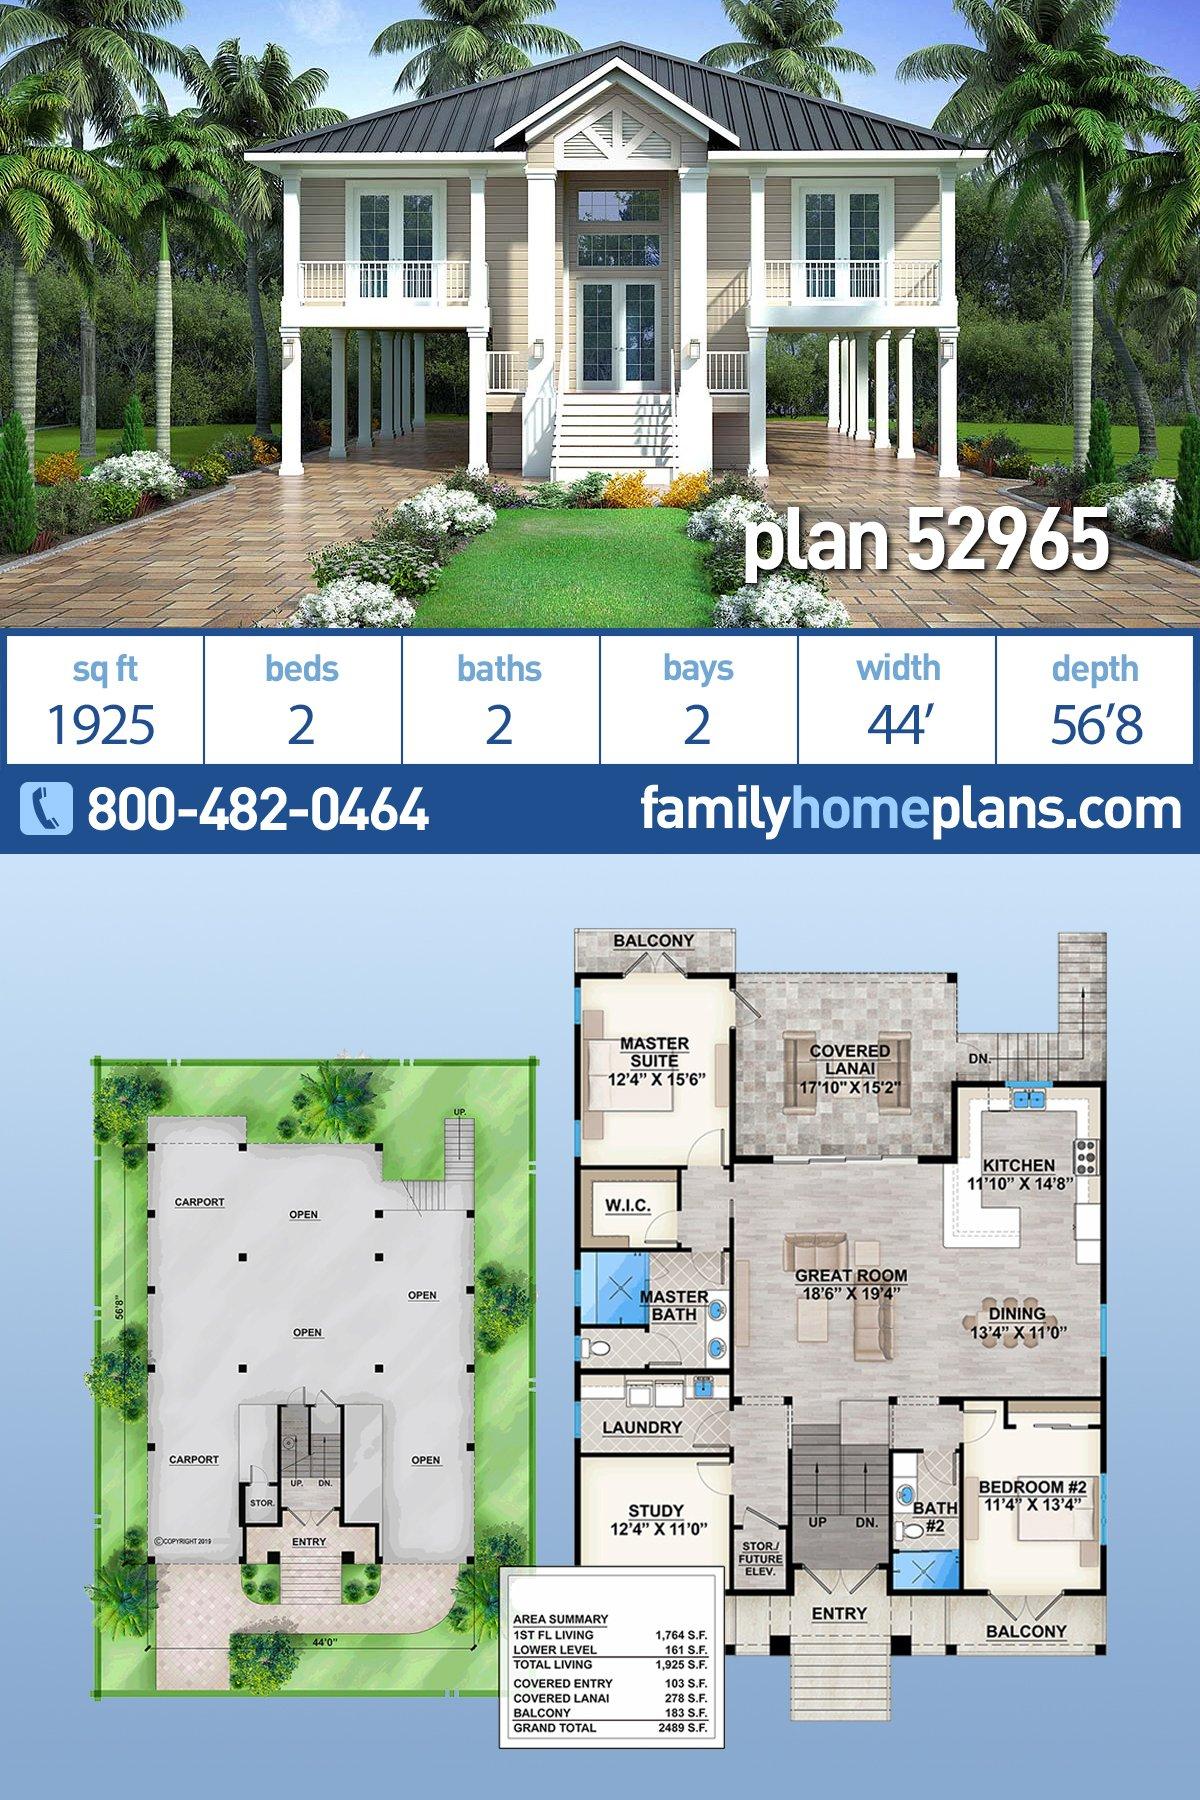 Coastal, Florida, Southern House Plan 52965 with 2 Beds, 2 Baths, 2 Car Garage